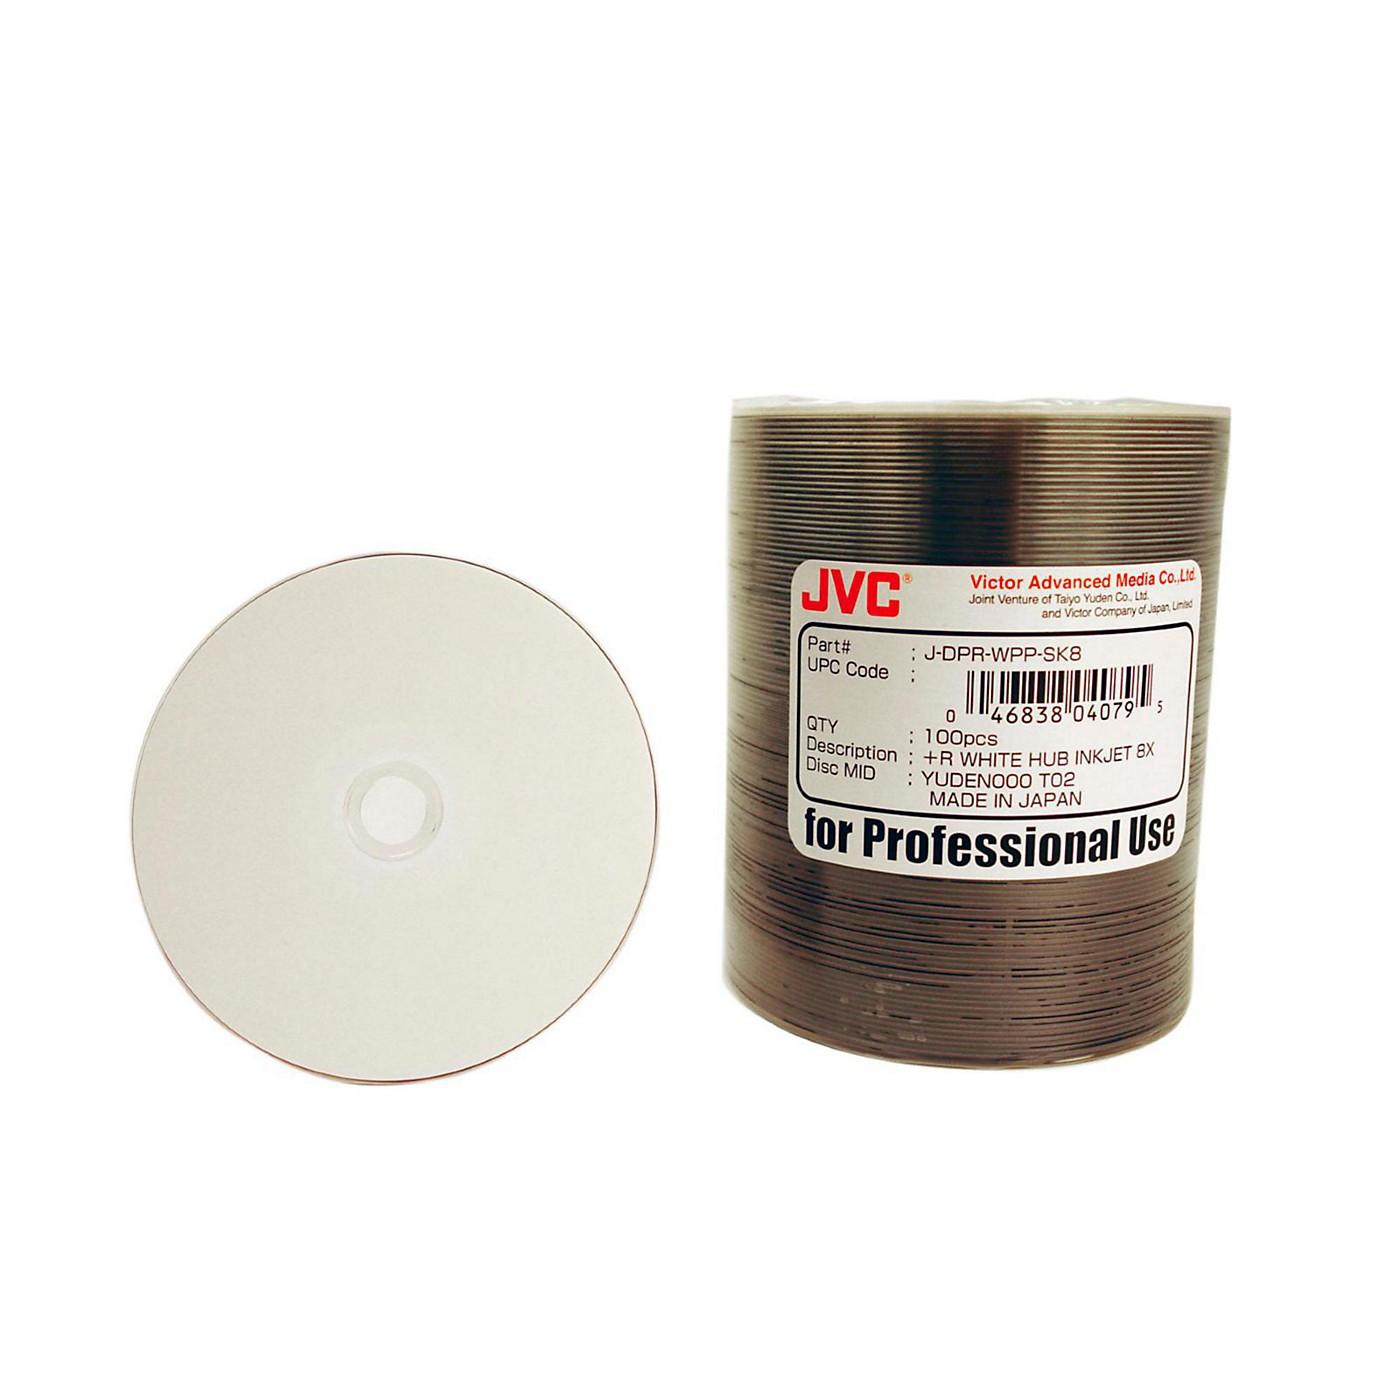 Taiyo Yuden 4.7GB DVD+R, 8X, White Inkjet-Printable and Hub Printable, 100 Disc Spindle thumbnail